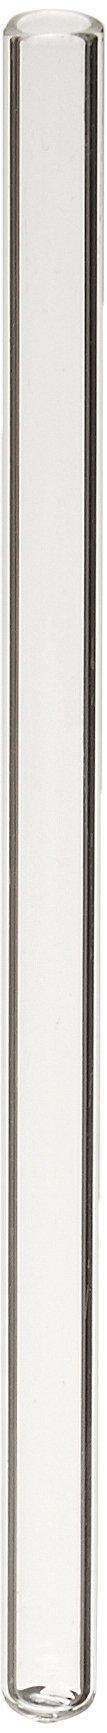 Bellco Glass 4025-00001 Borosilicate Glass Round Bottom Freeze Drying Tubular Ampoule, 1ml Capacity (Case of 144)